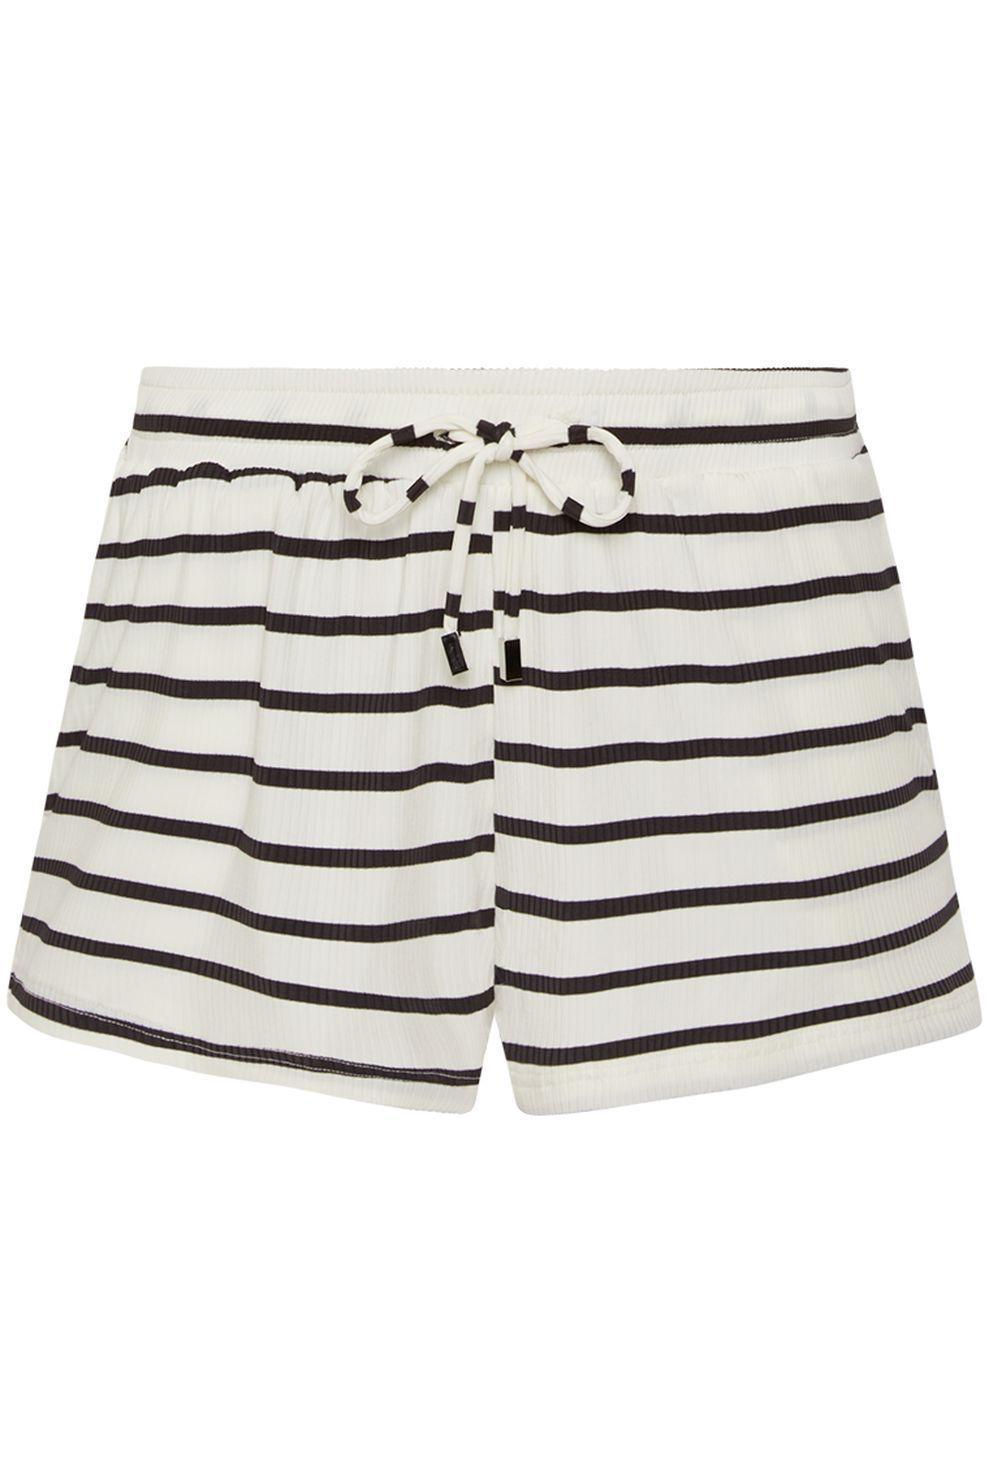 Beachlife Short 170806 voor dames - Zwart/Wit - Maten: S, M, L, XL